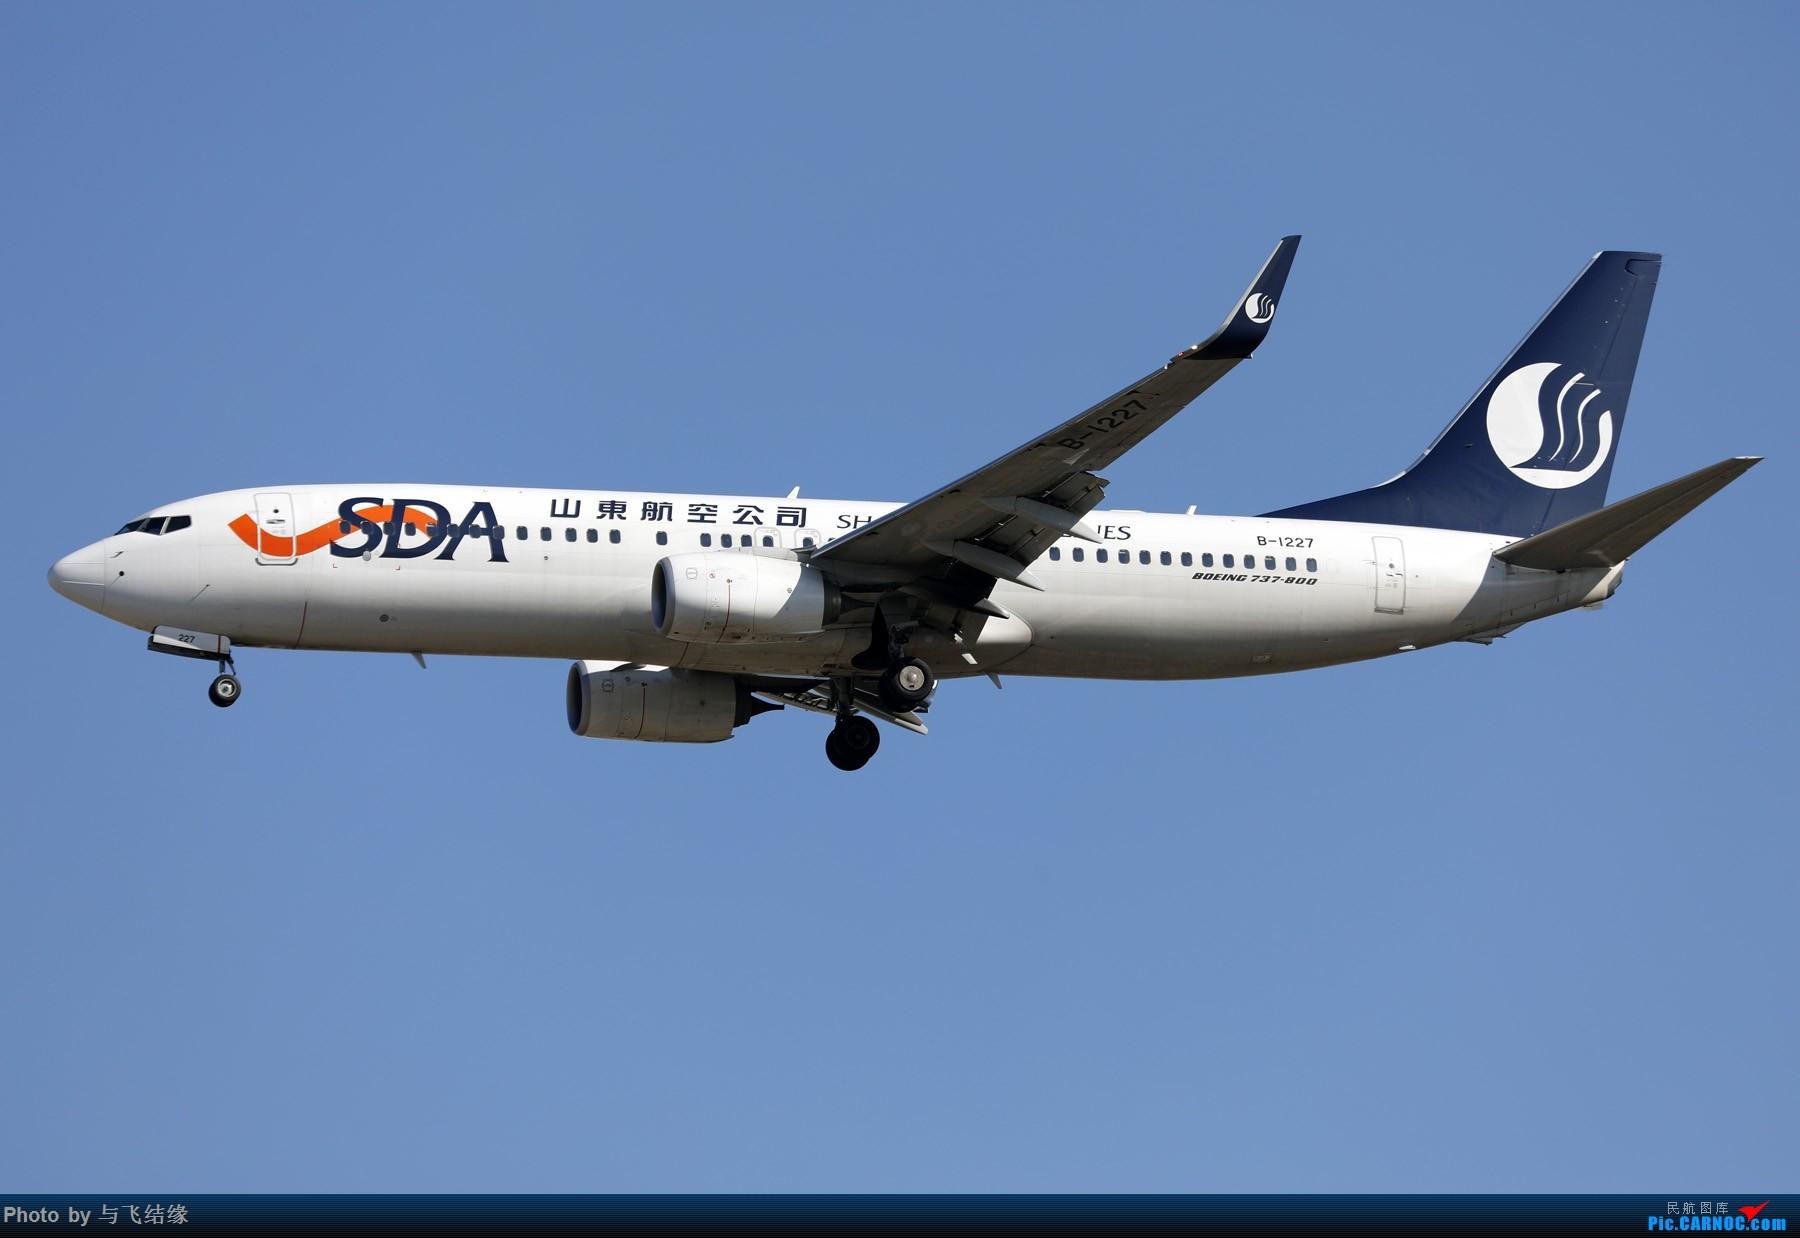 Re:[原创]以色列航空波音777-200、加拿大航空波音77W新装、国航最新空客350-900. BOEING 737-800 B-1227 中国北京首都国际机场